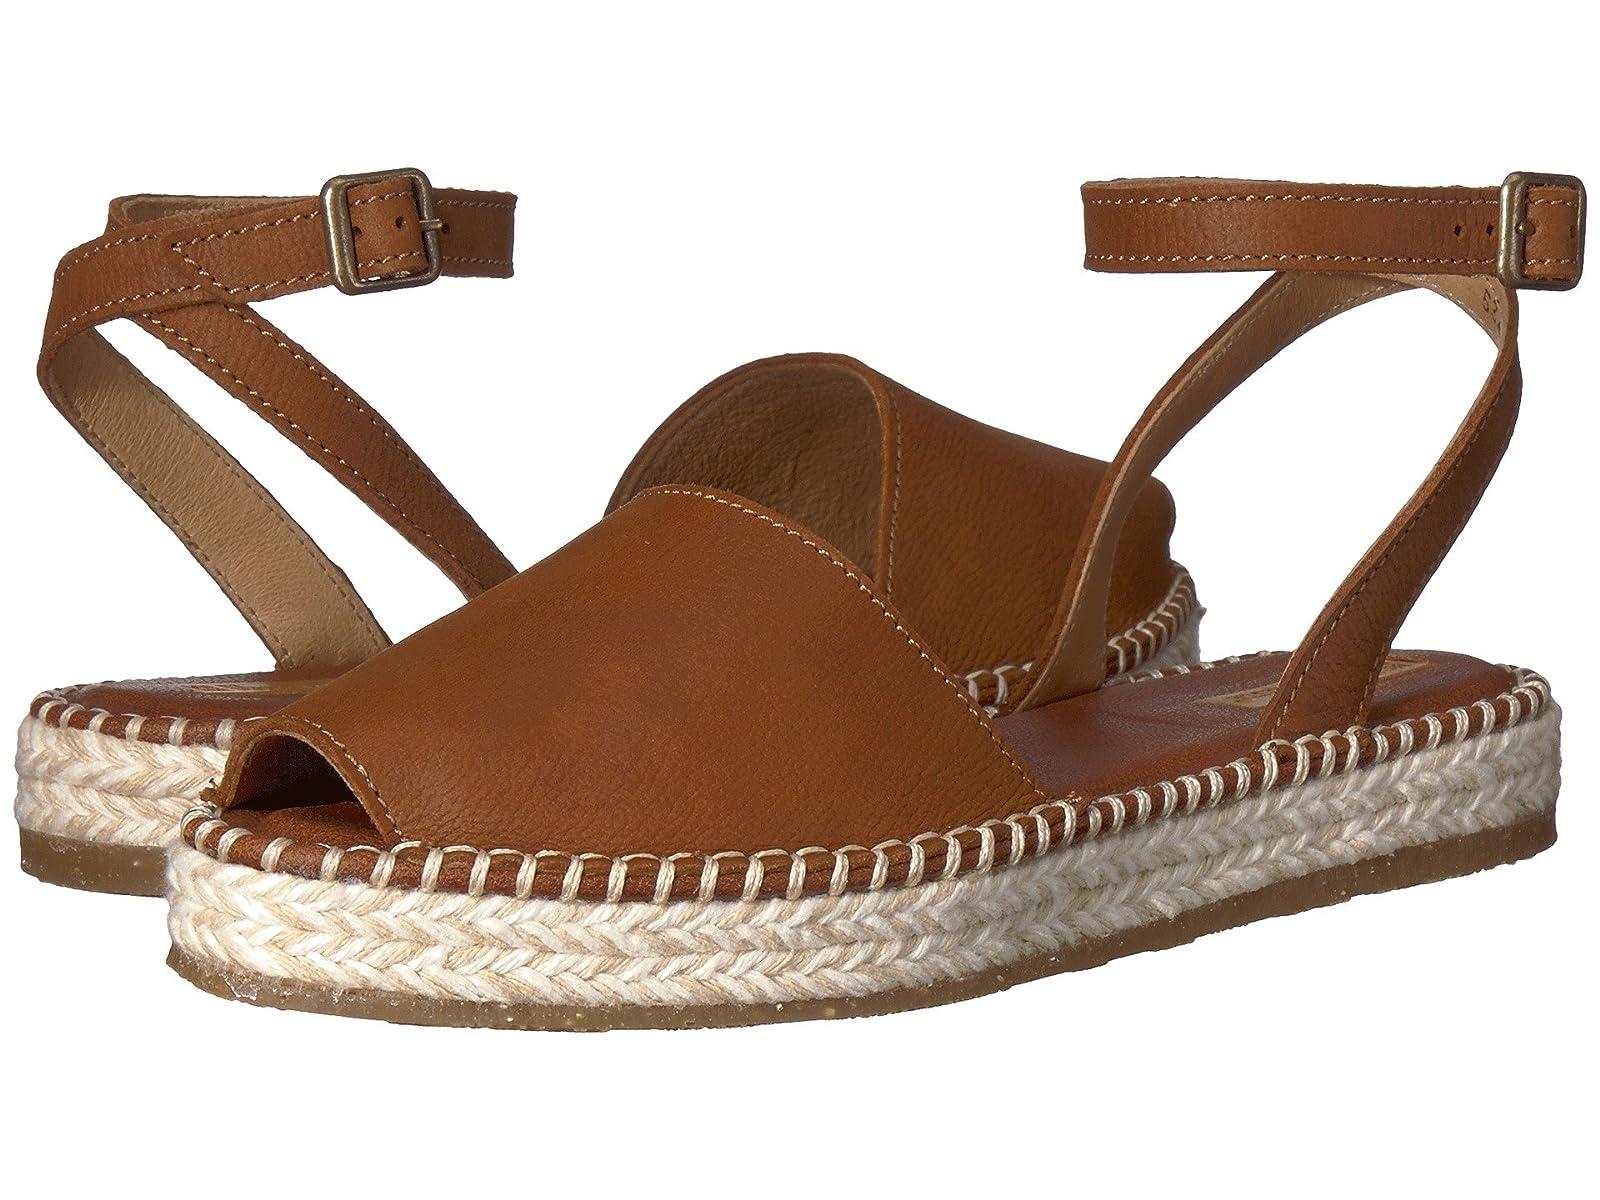 El Naturalista Marine N5343Atmospheric grades have affordable shoes